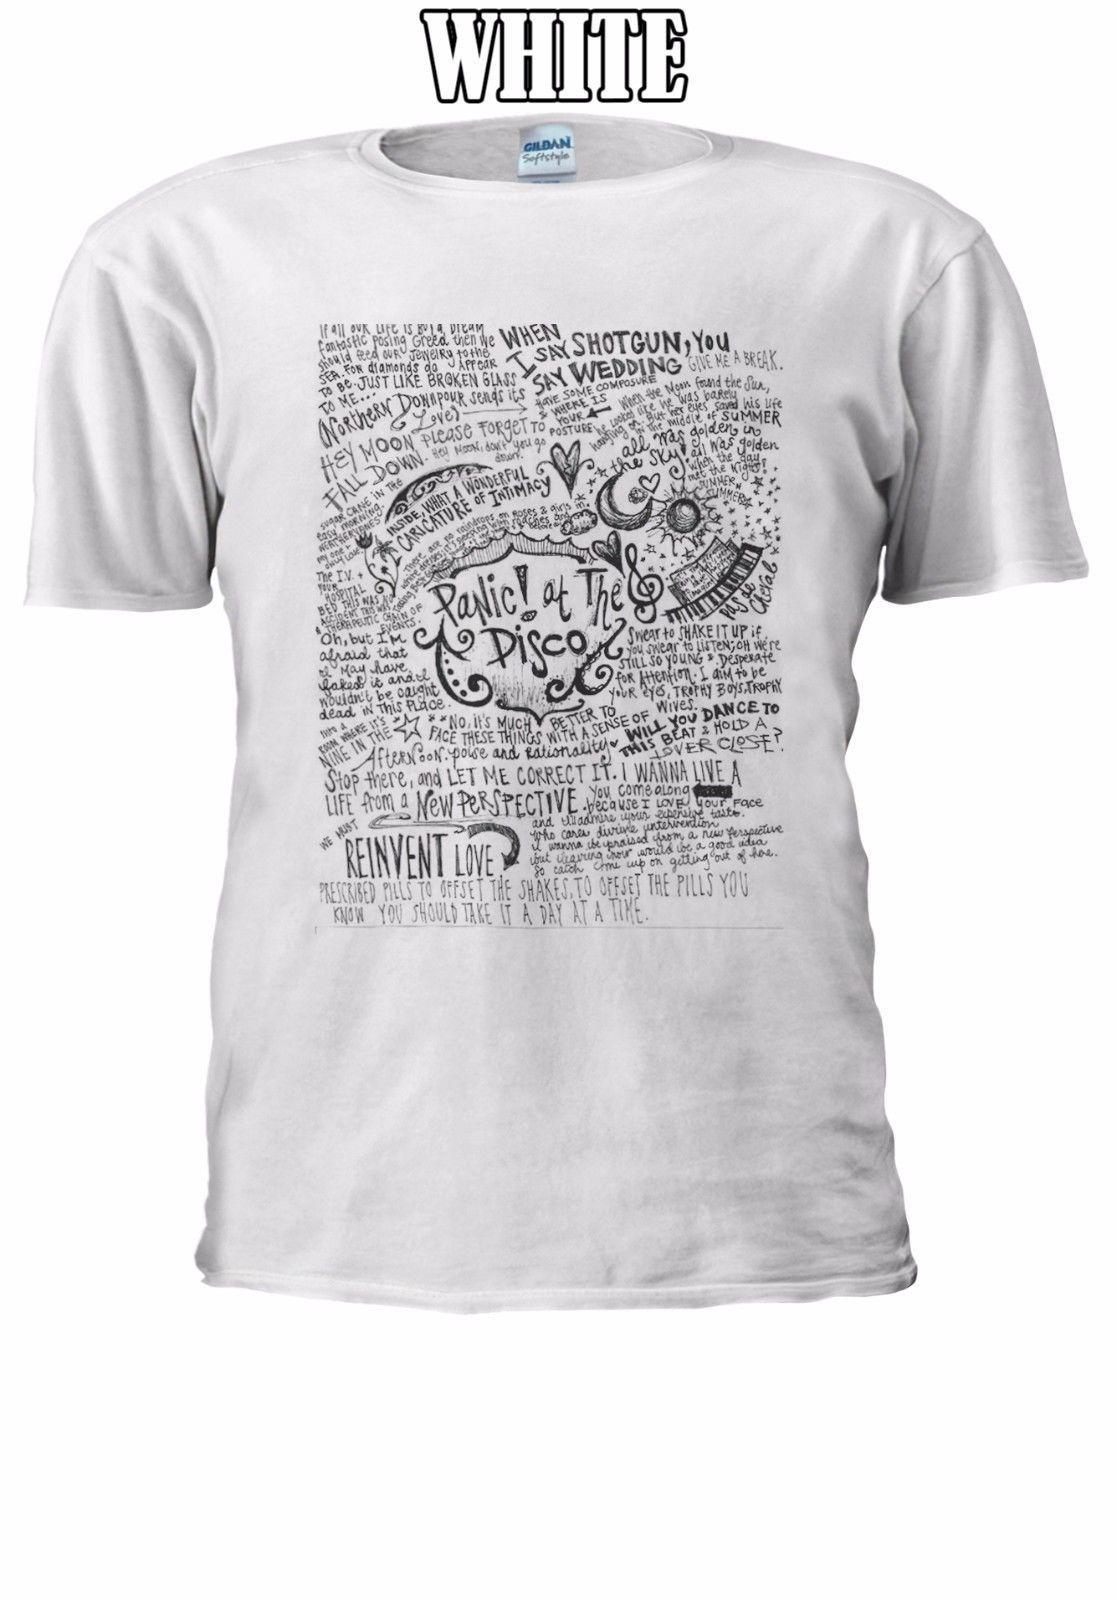 0db89e22aed196 Panic! At The Disco American Band T Shirt Vest Tank Top Men Women Unisex  2556 Jacket Croatia Leather Tshirt Denim Clothes Camiseta T Shirt Weird T  Shirts T ...